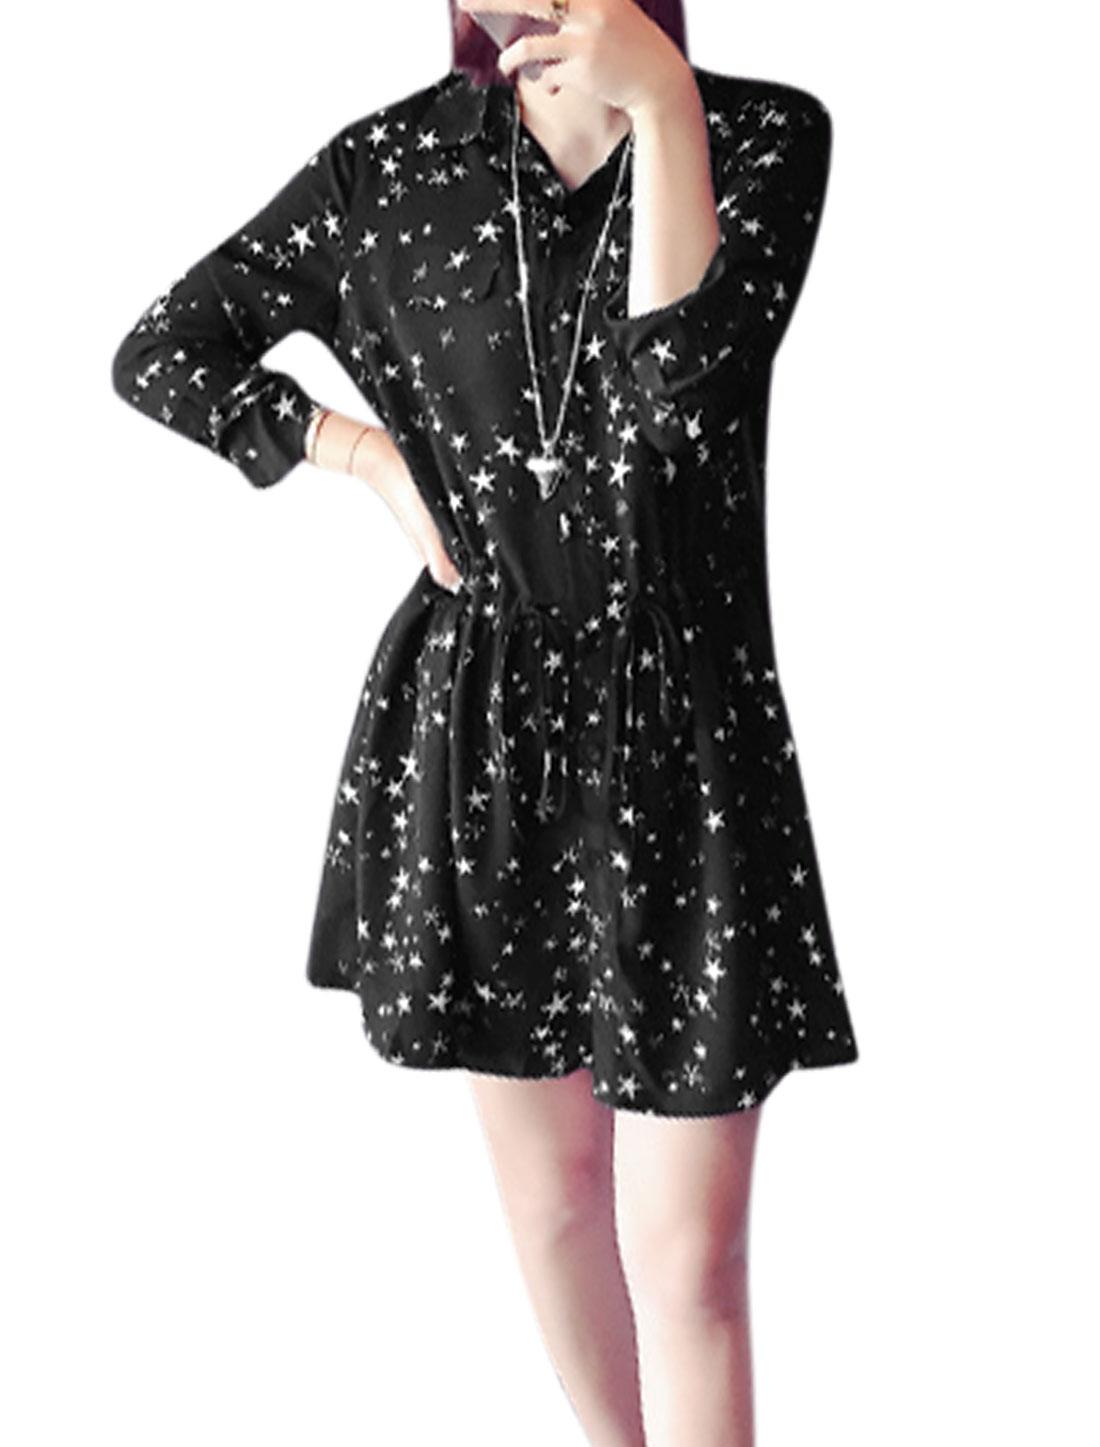 Women Point Collar Stars Prints Long Sleeves Chiffon Shirt Dress Black XS